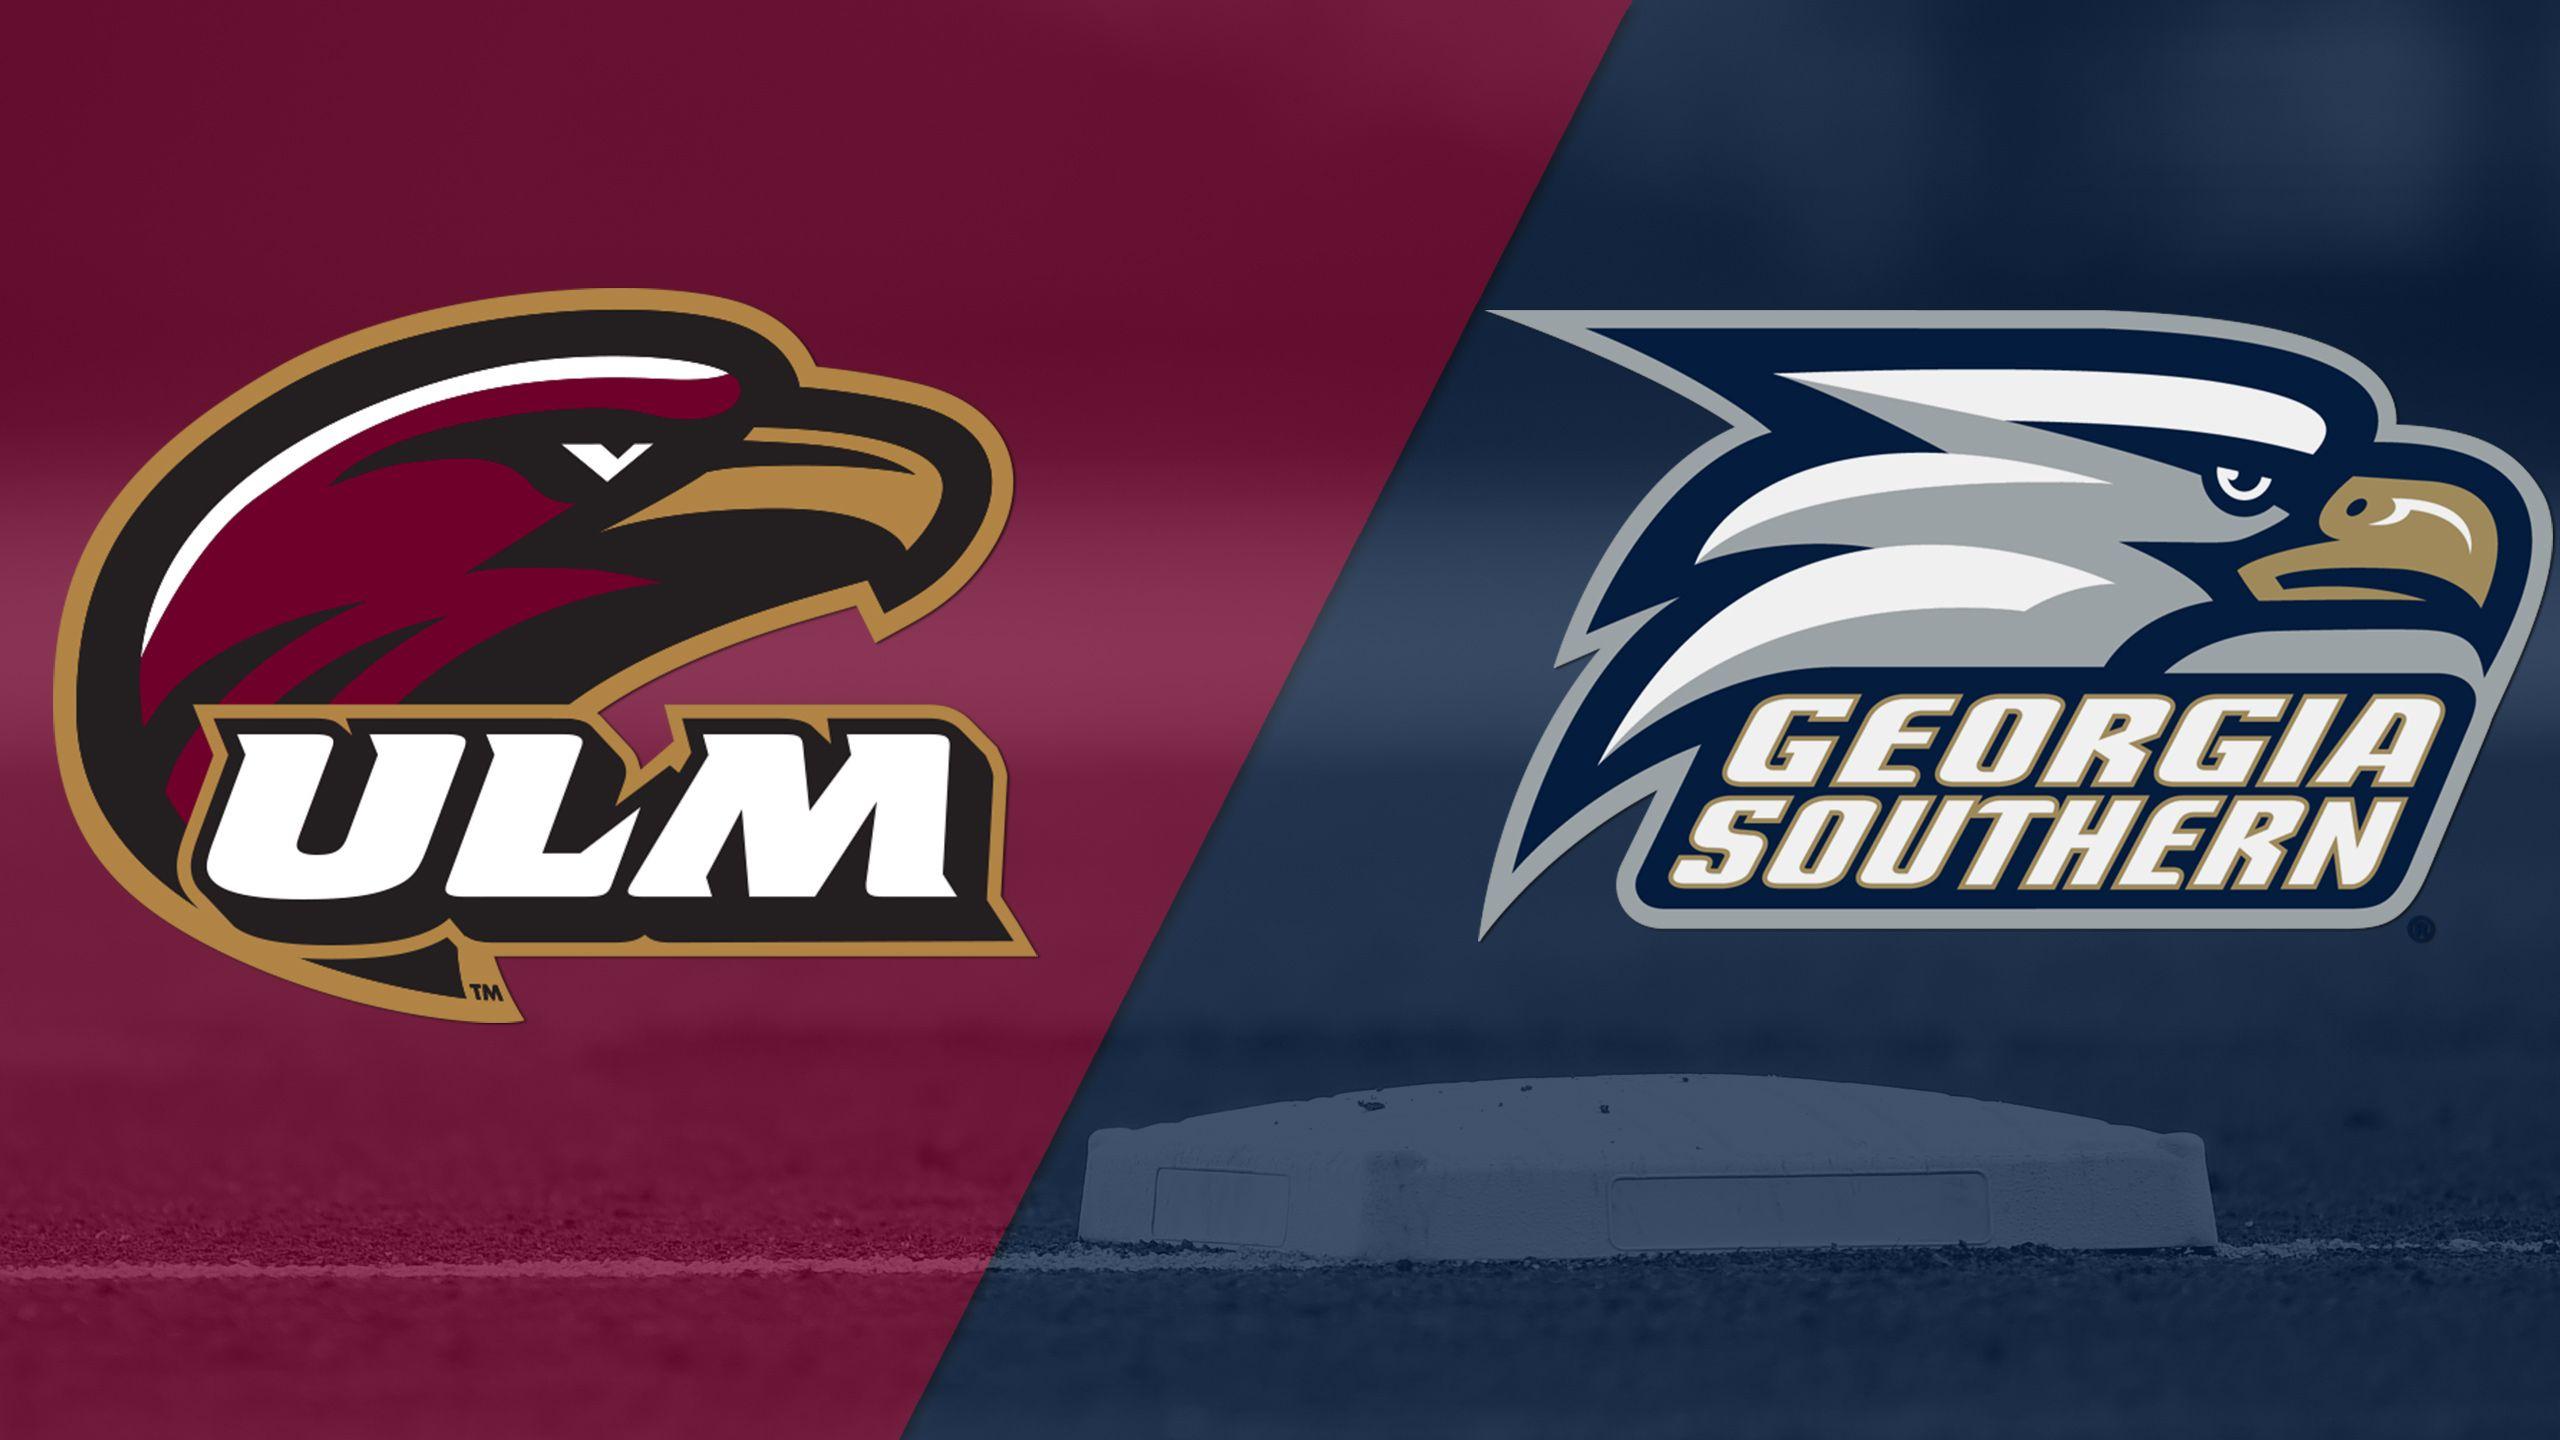 UL Monroe vs. Georgia Southern (Game #2) (Sun Belt Softball Championship)